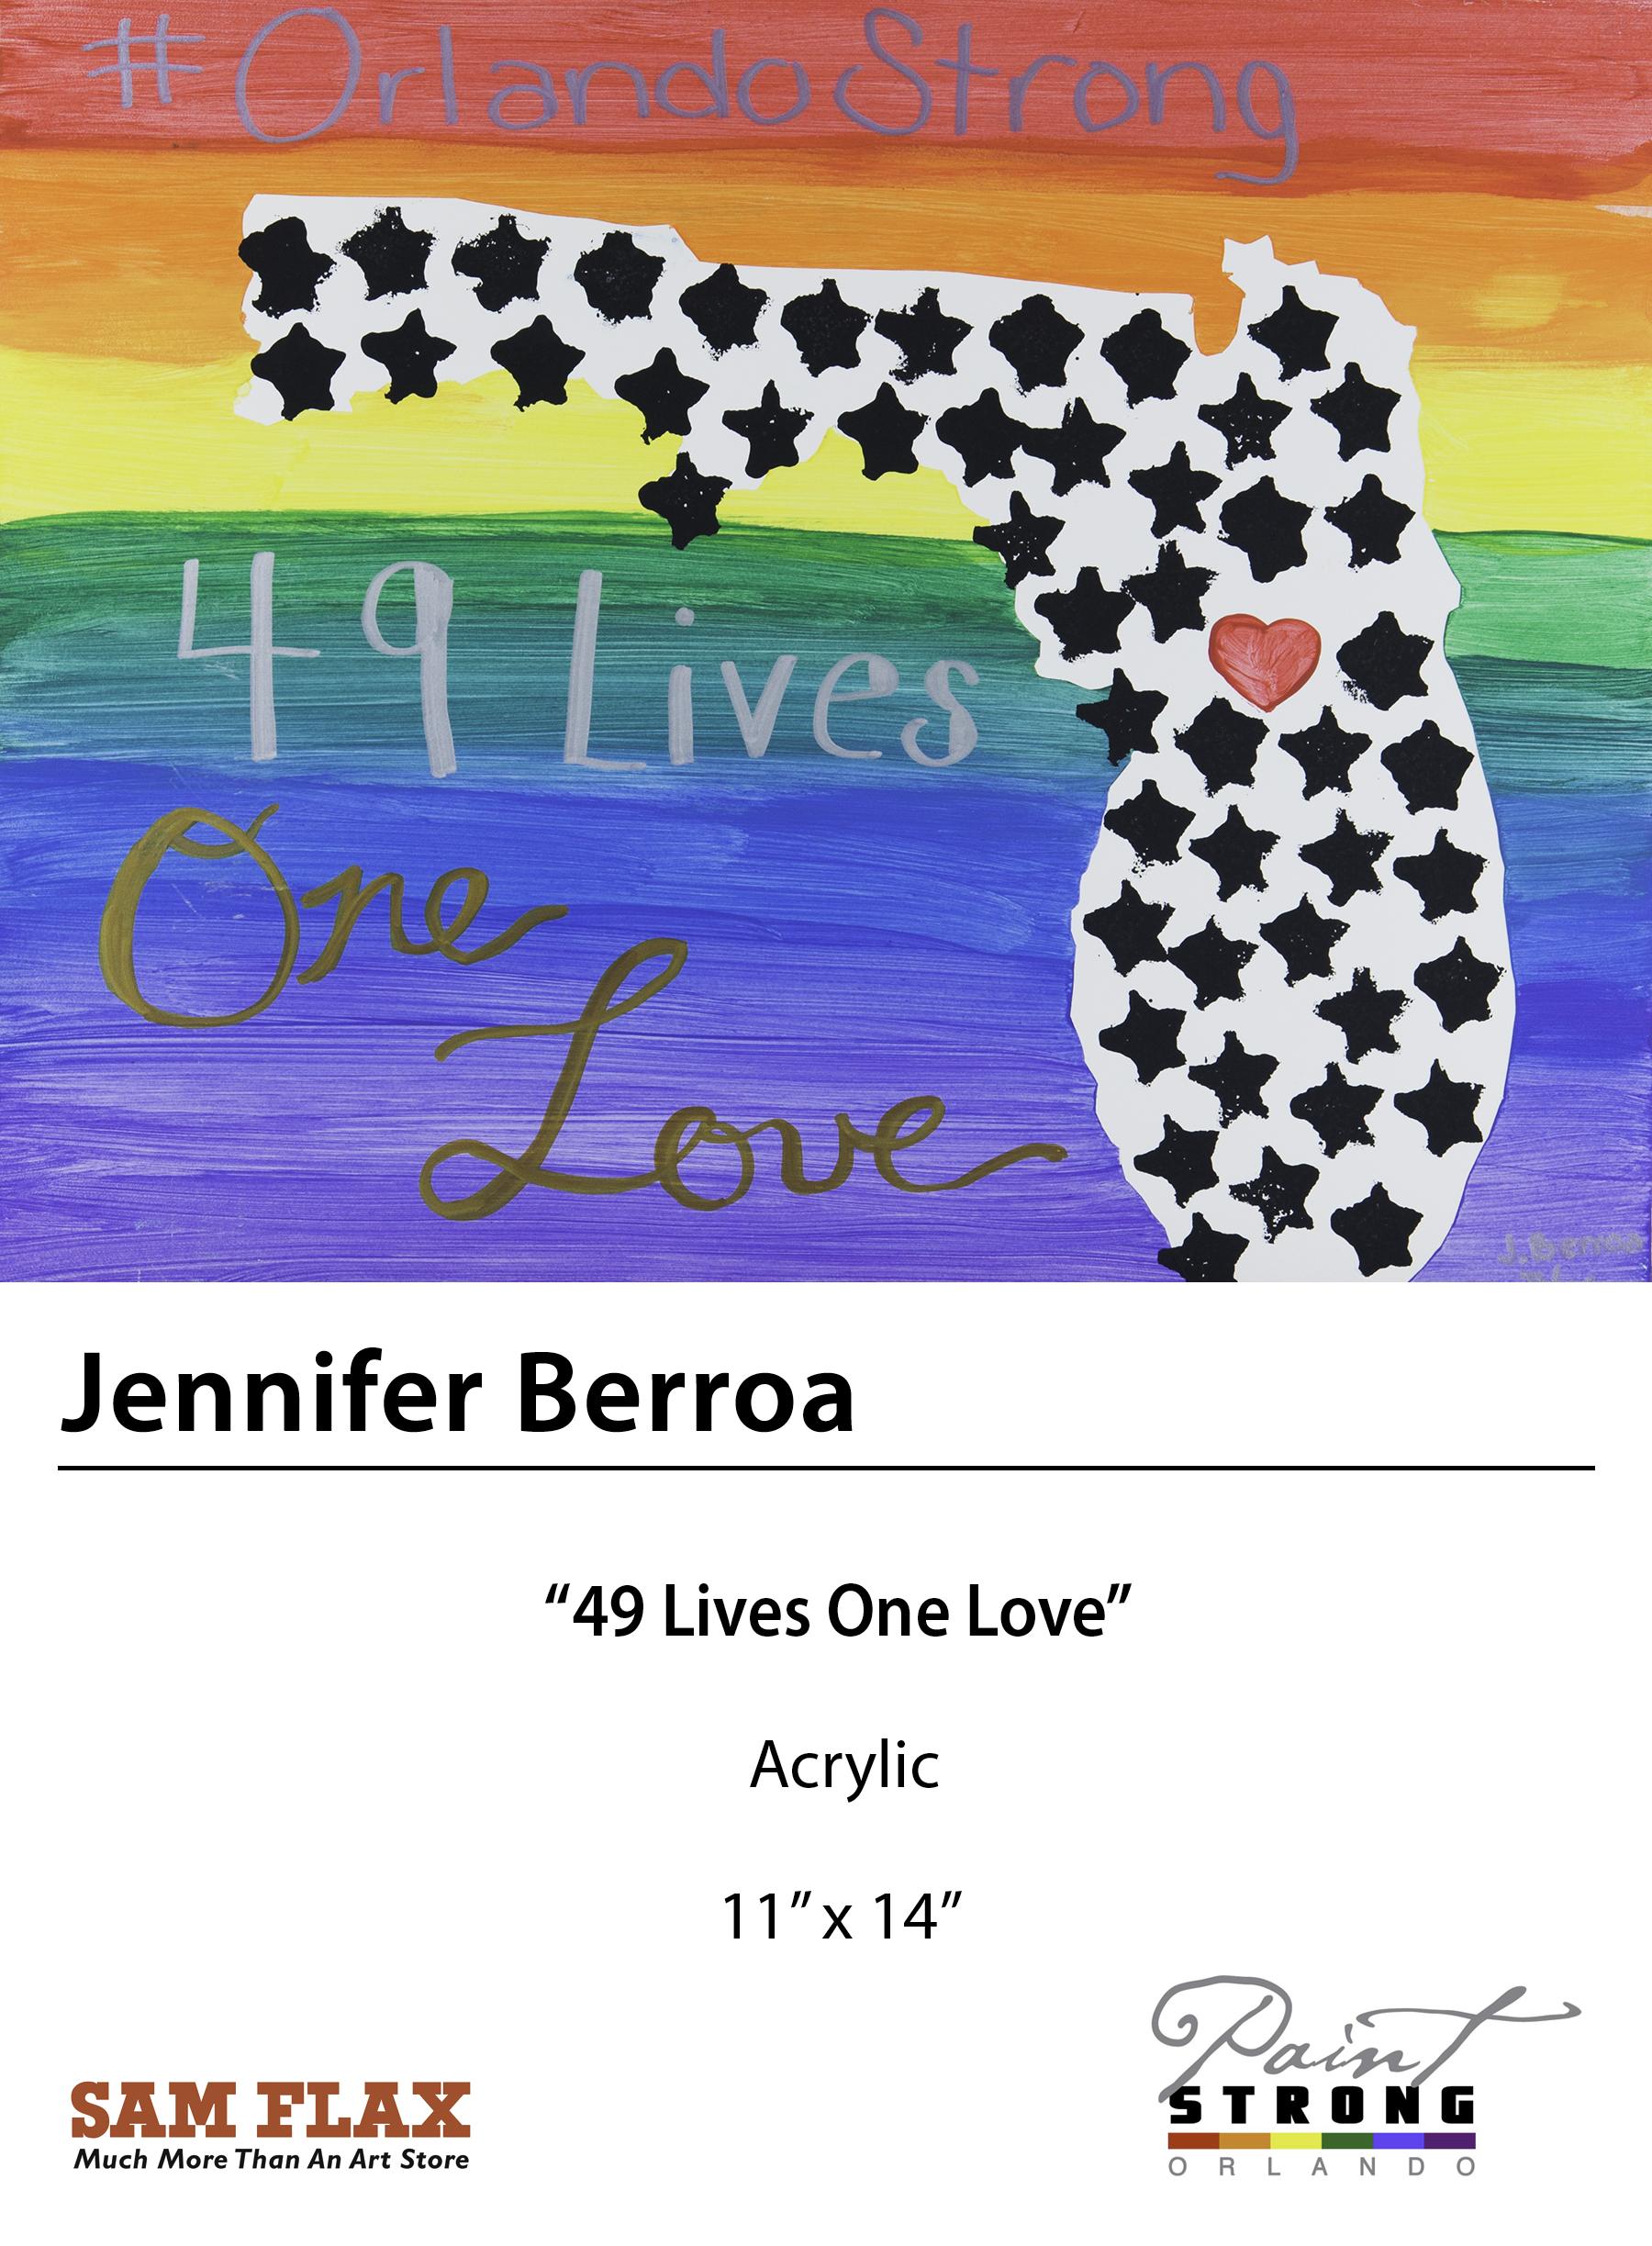 Jennifer Berroa